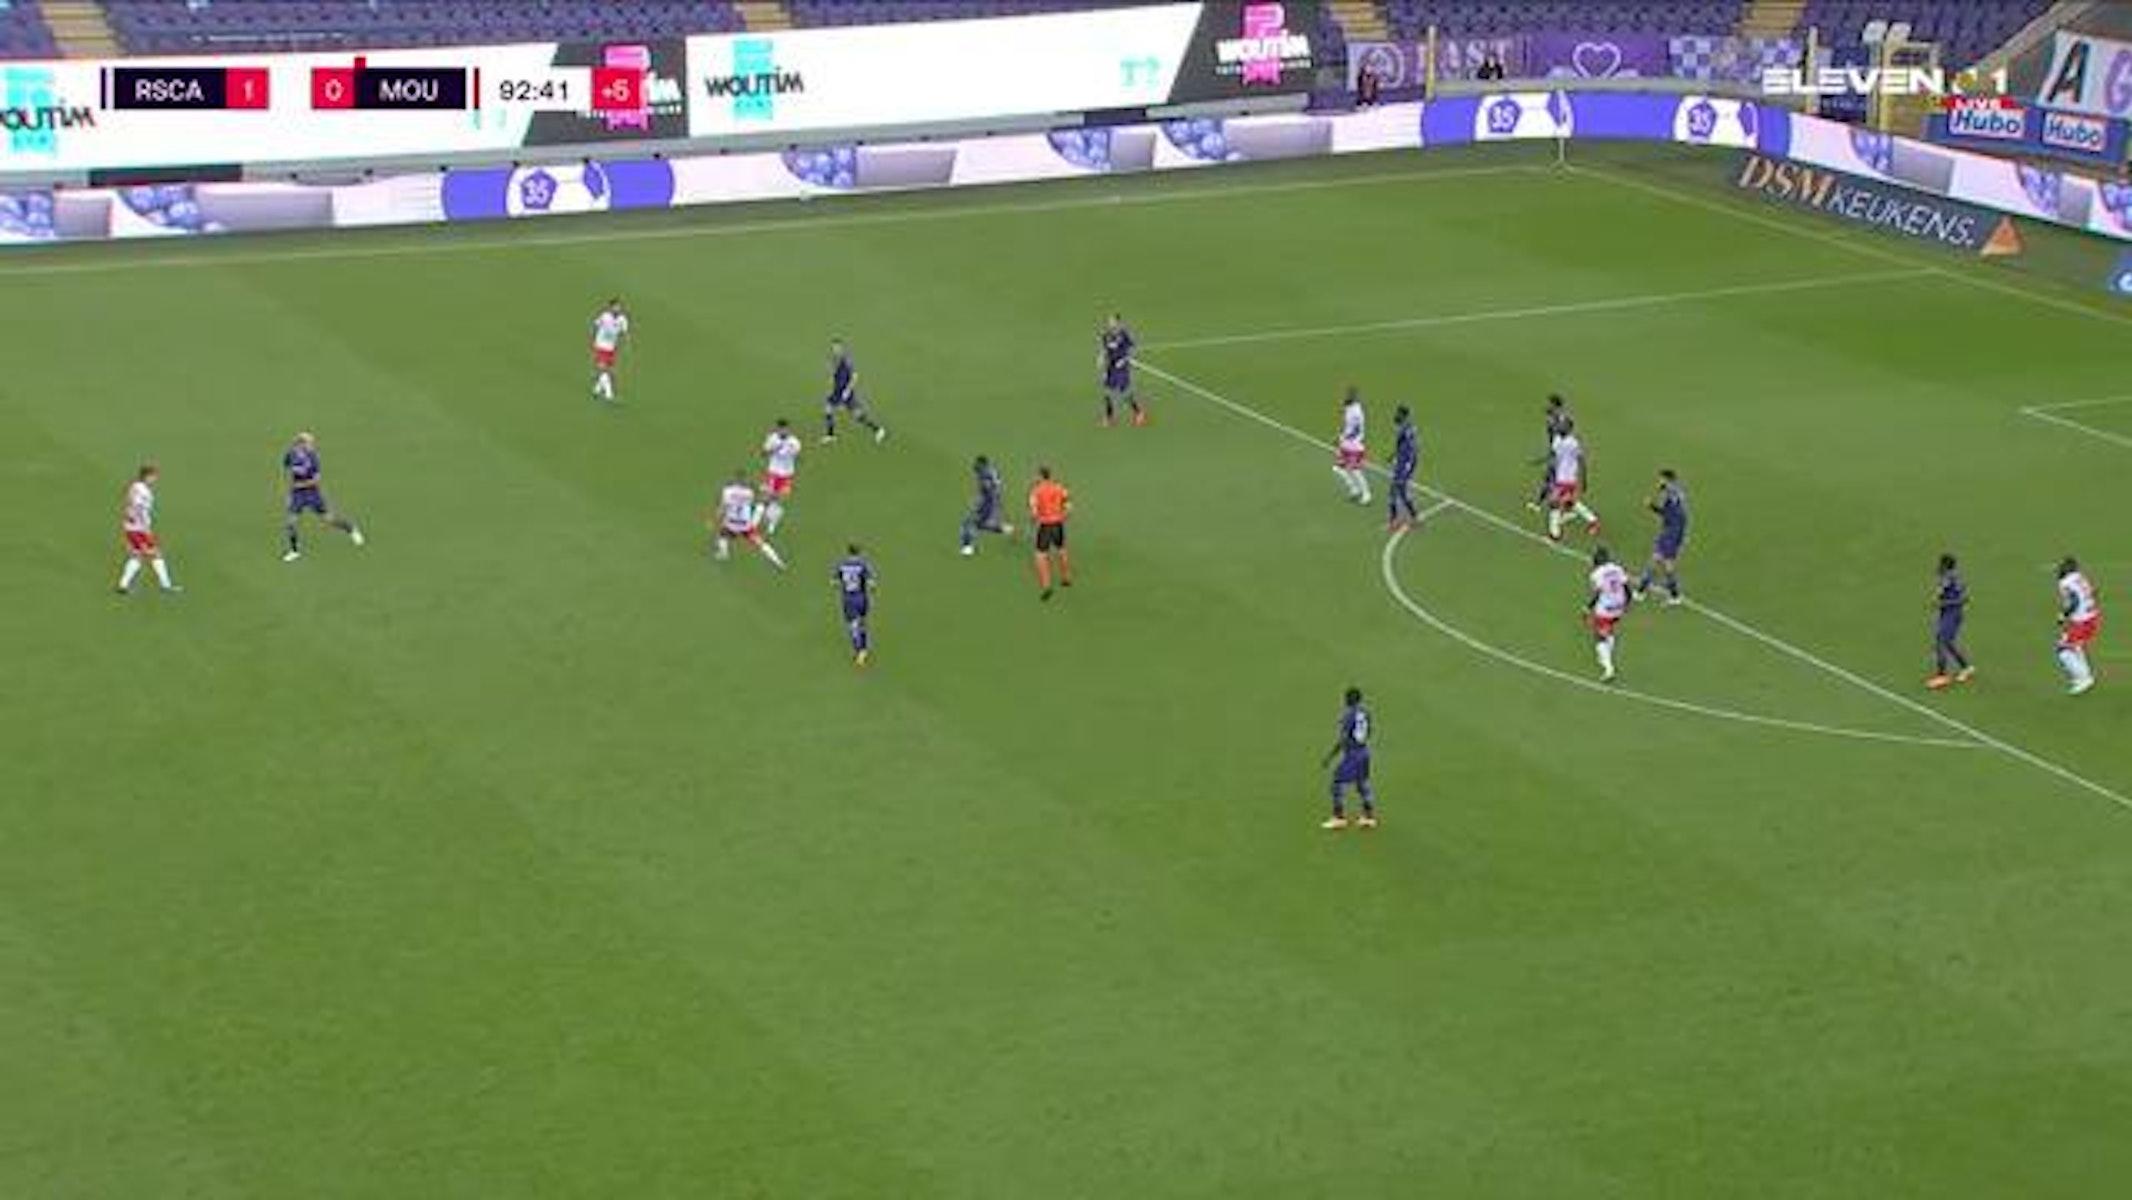 Doelpunt Harlem-Eddy Gnohere (RSC Anderlecht vs. Royal Excel Mouscron)